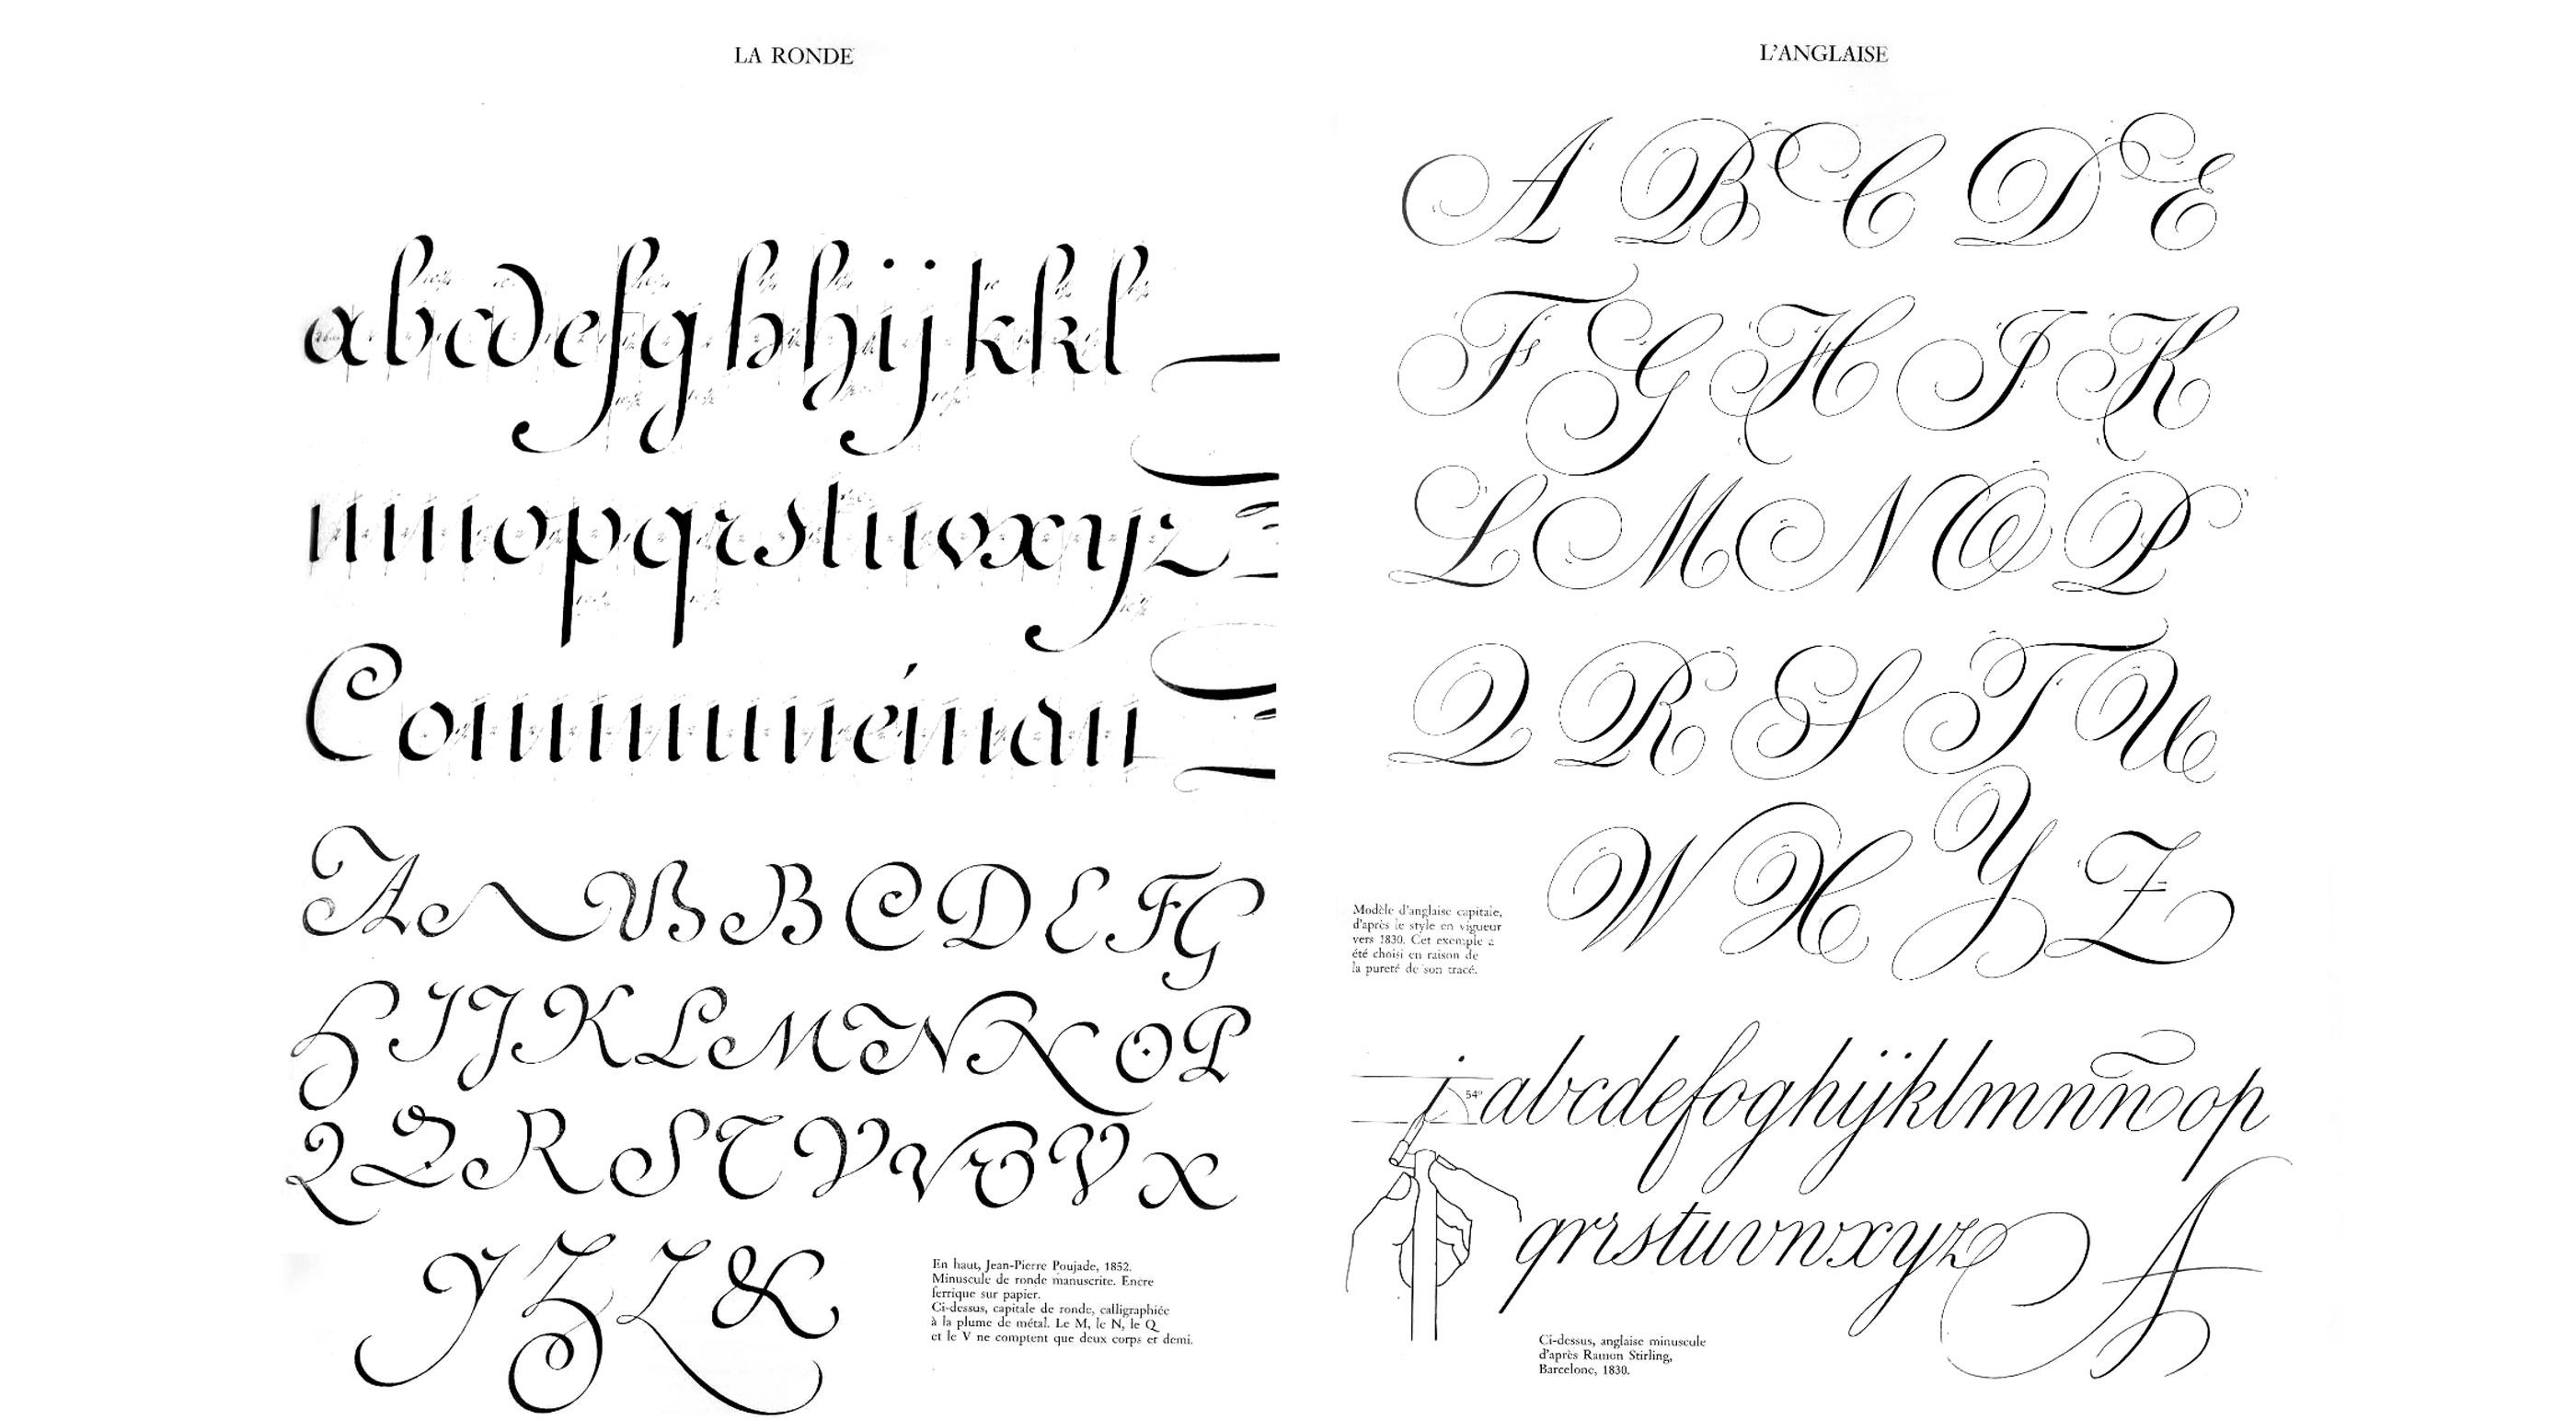 claude-mediavilla-calligraphie-la-ronde-l-angaise-nb